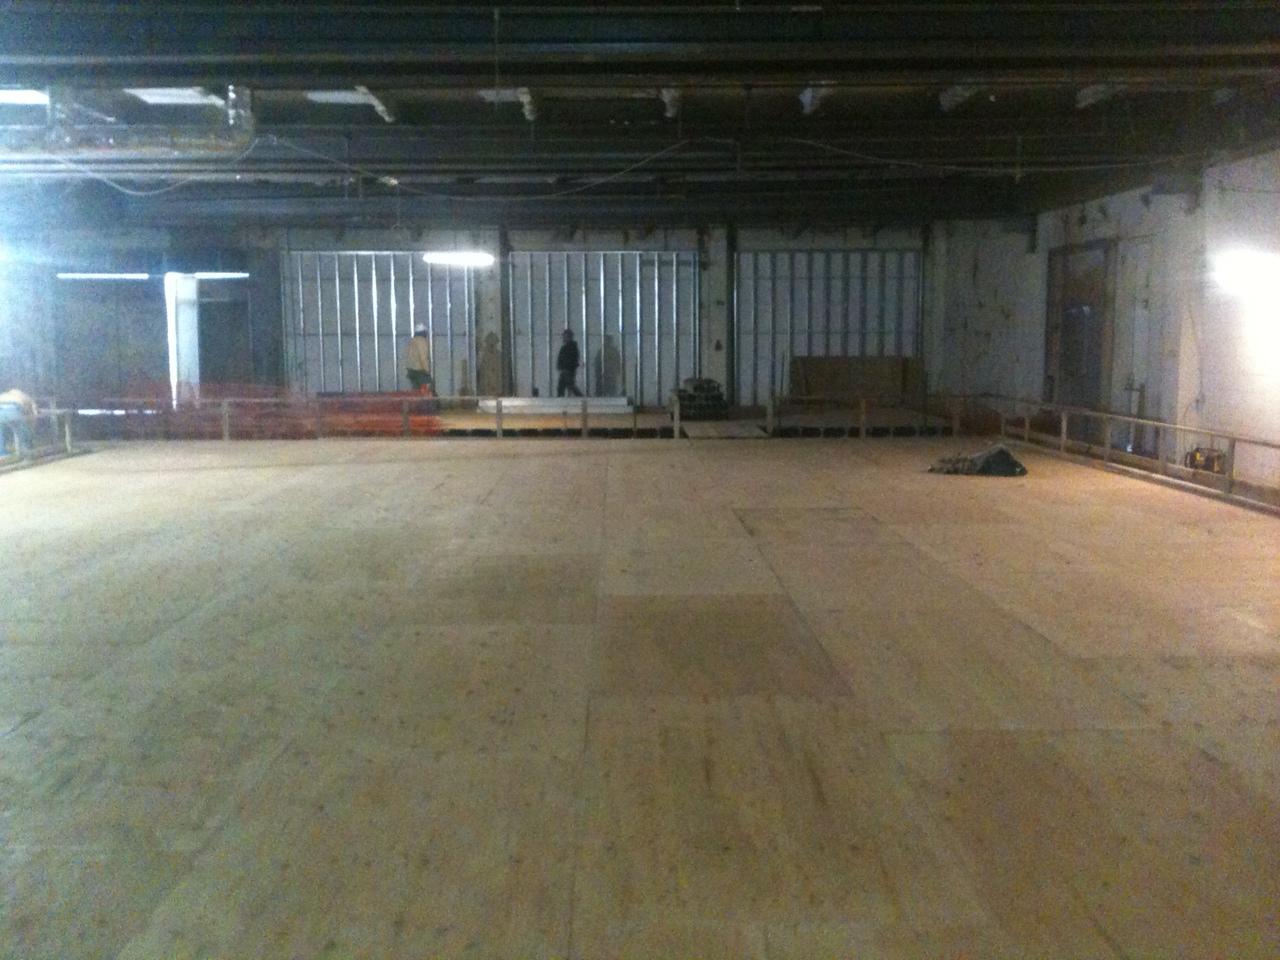 Superior scaffold, scaffold rental, scaffolding rental, NY, NJ, PA, Philadelphia